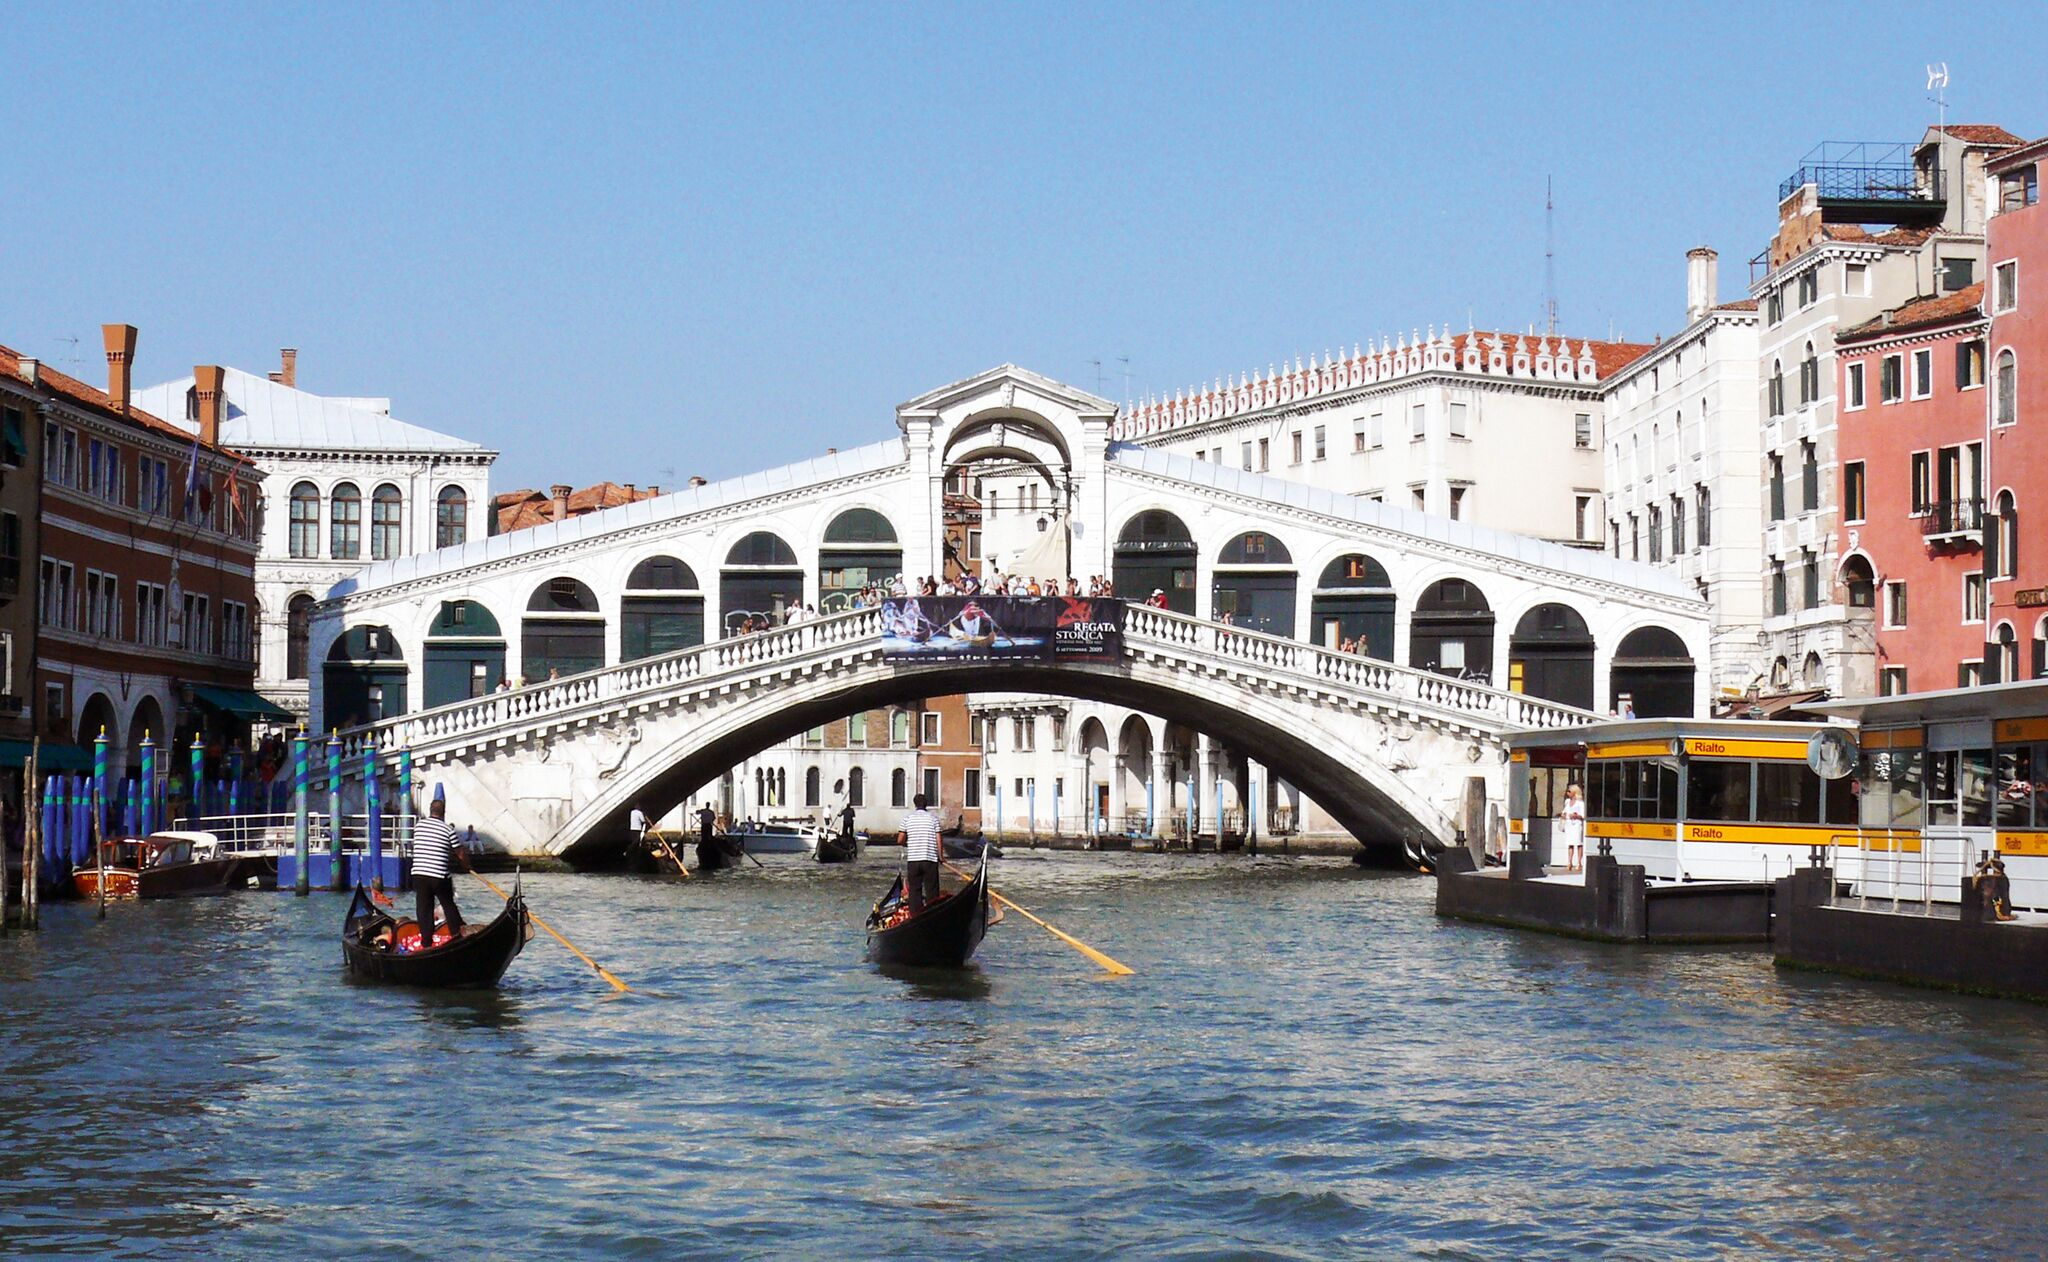 Toscana-canal grande.jpg